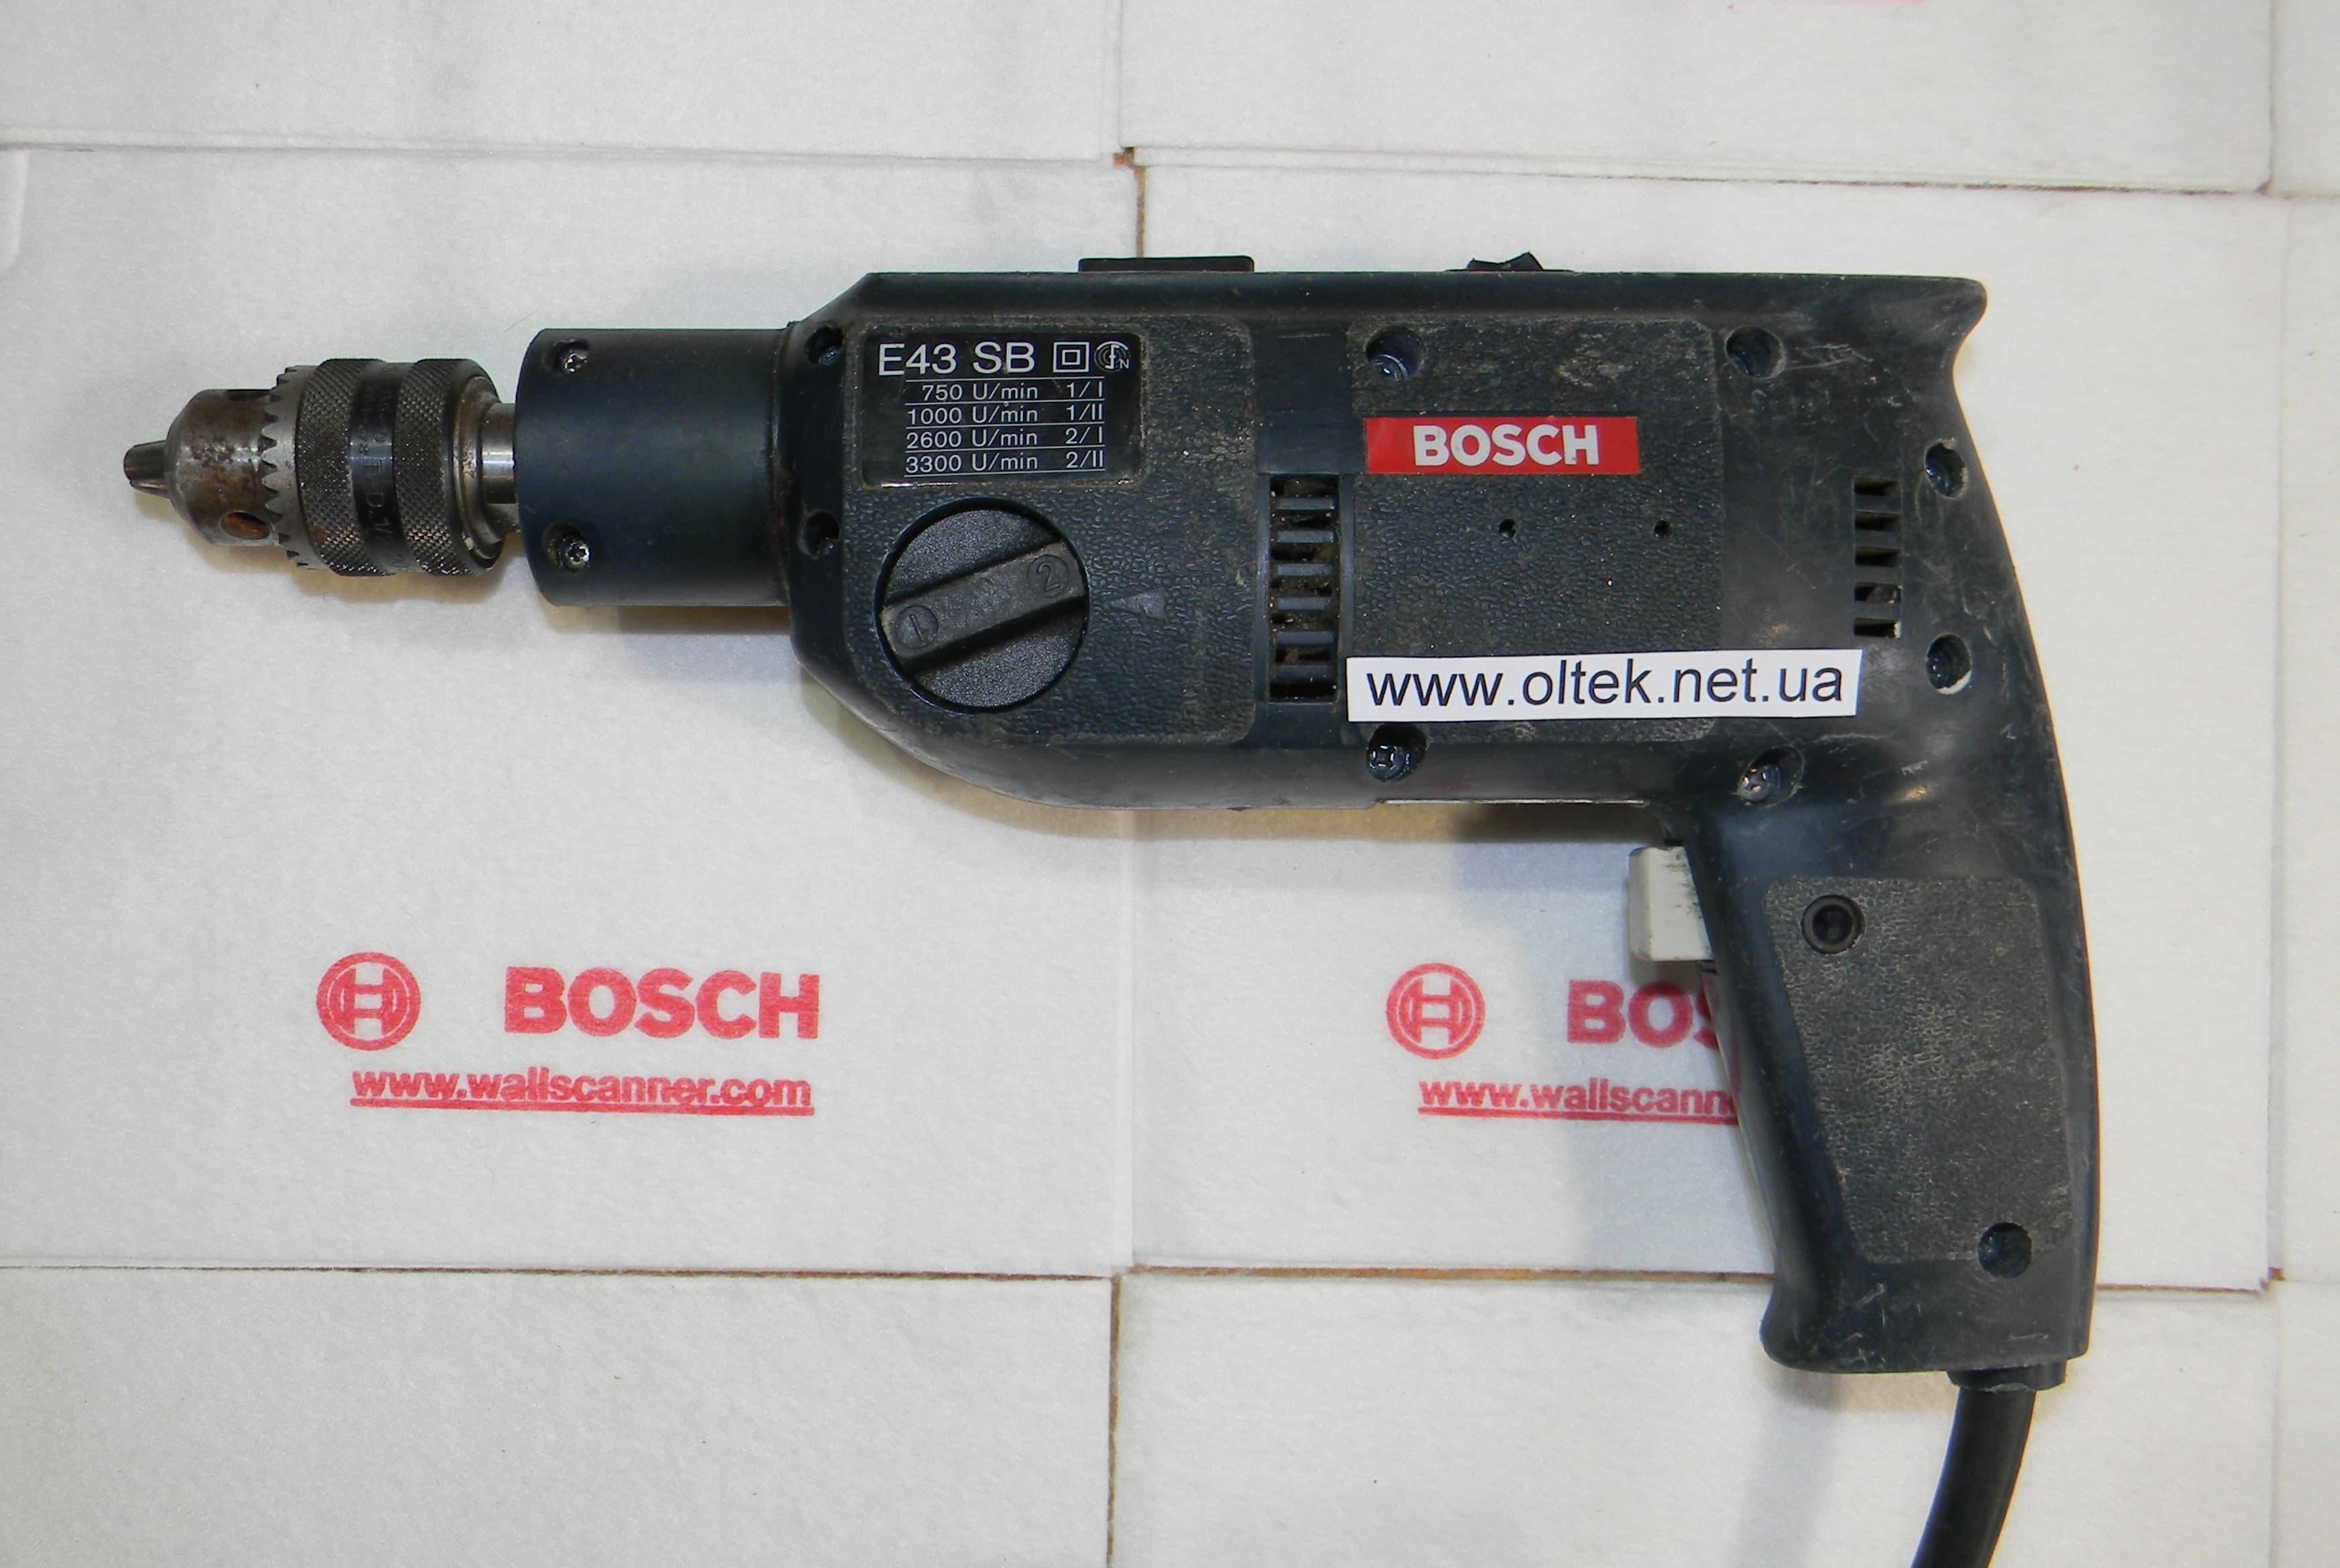 bosch-E43-SB